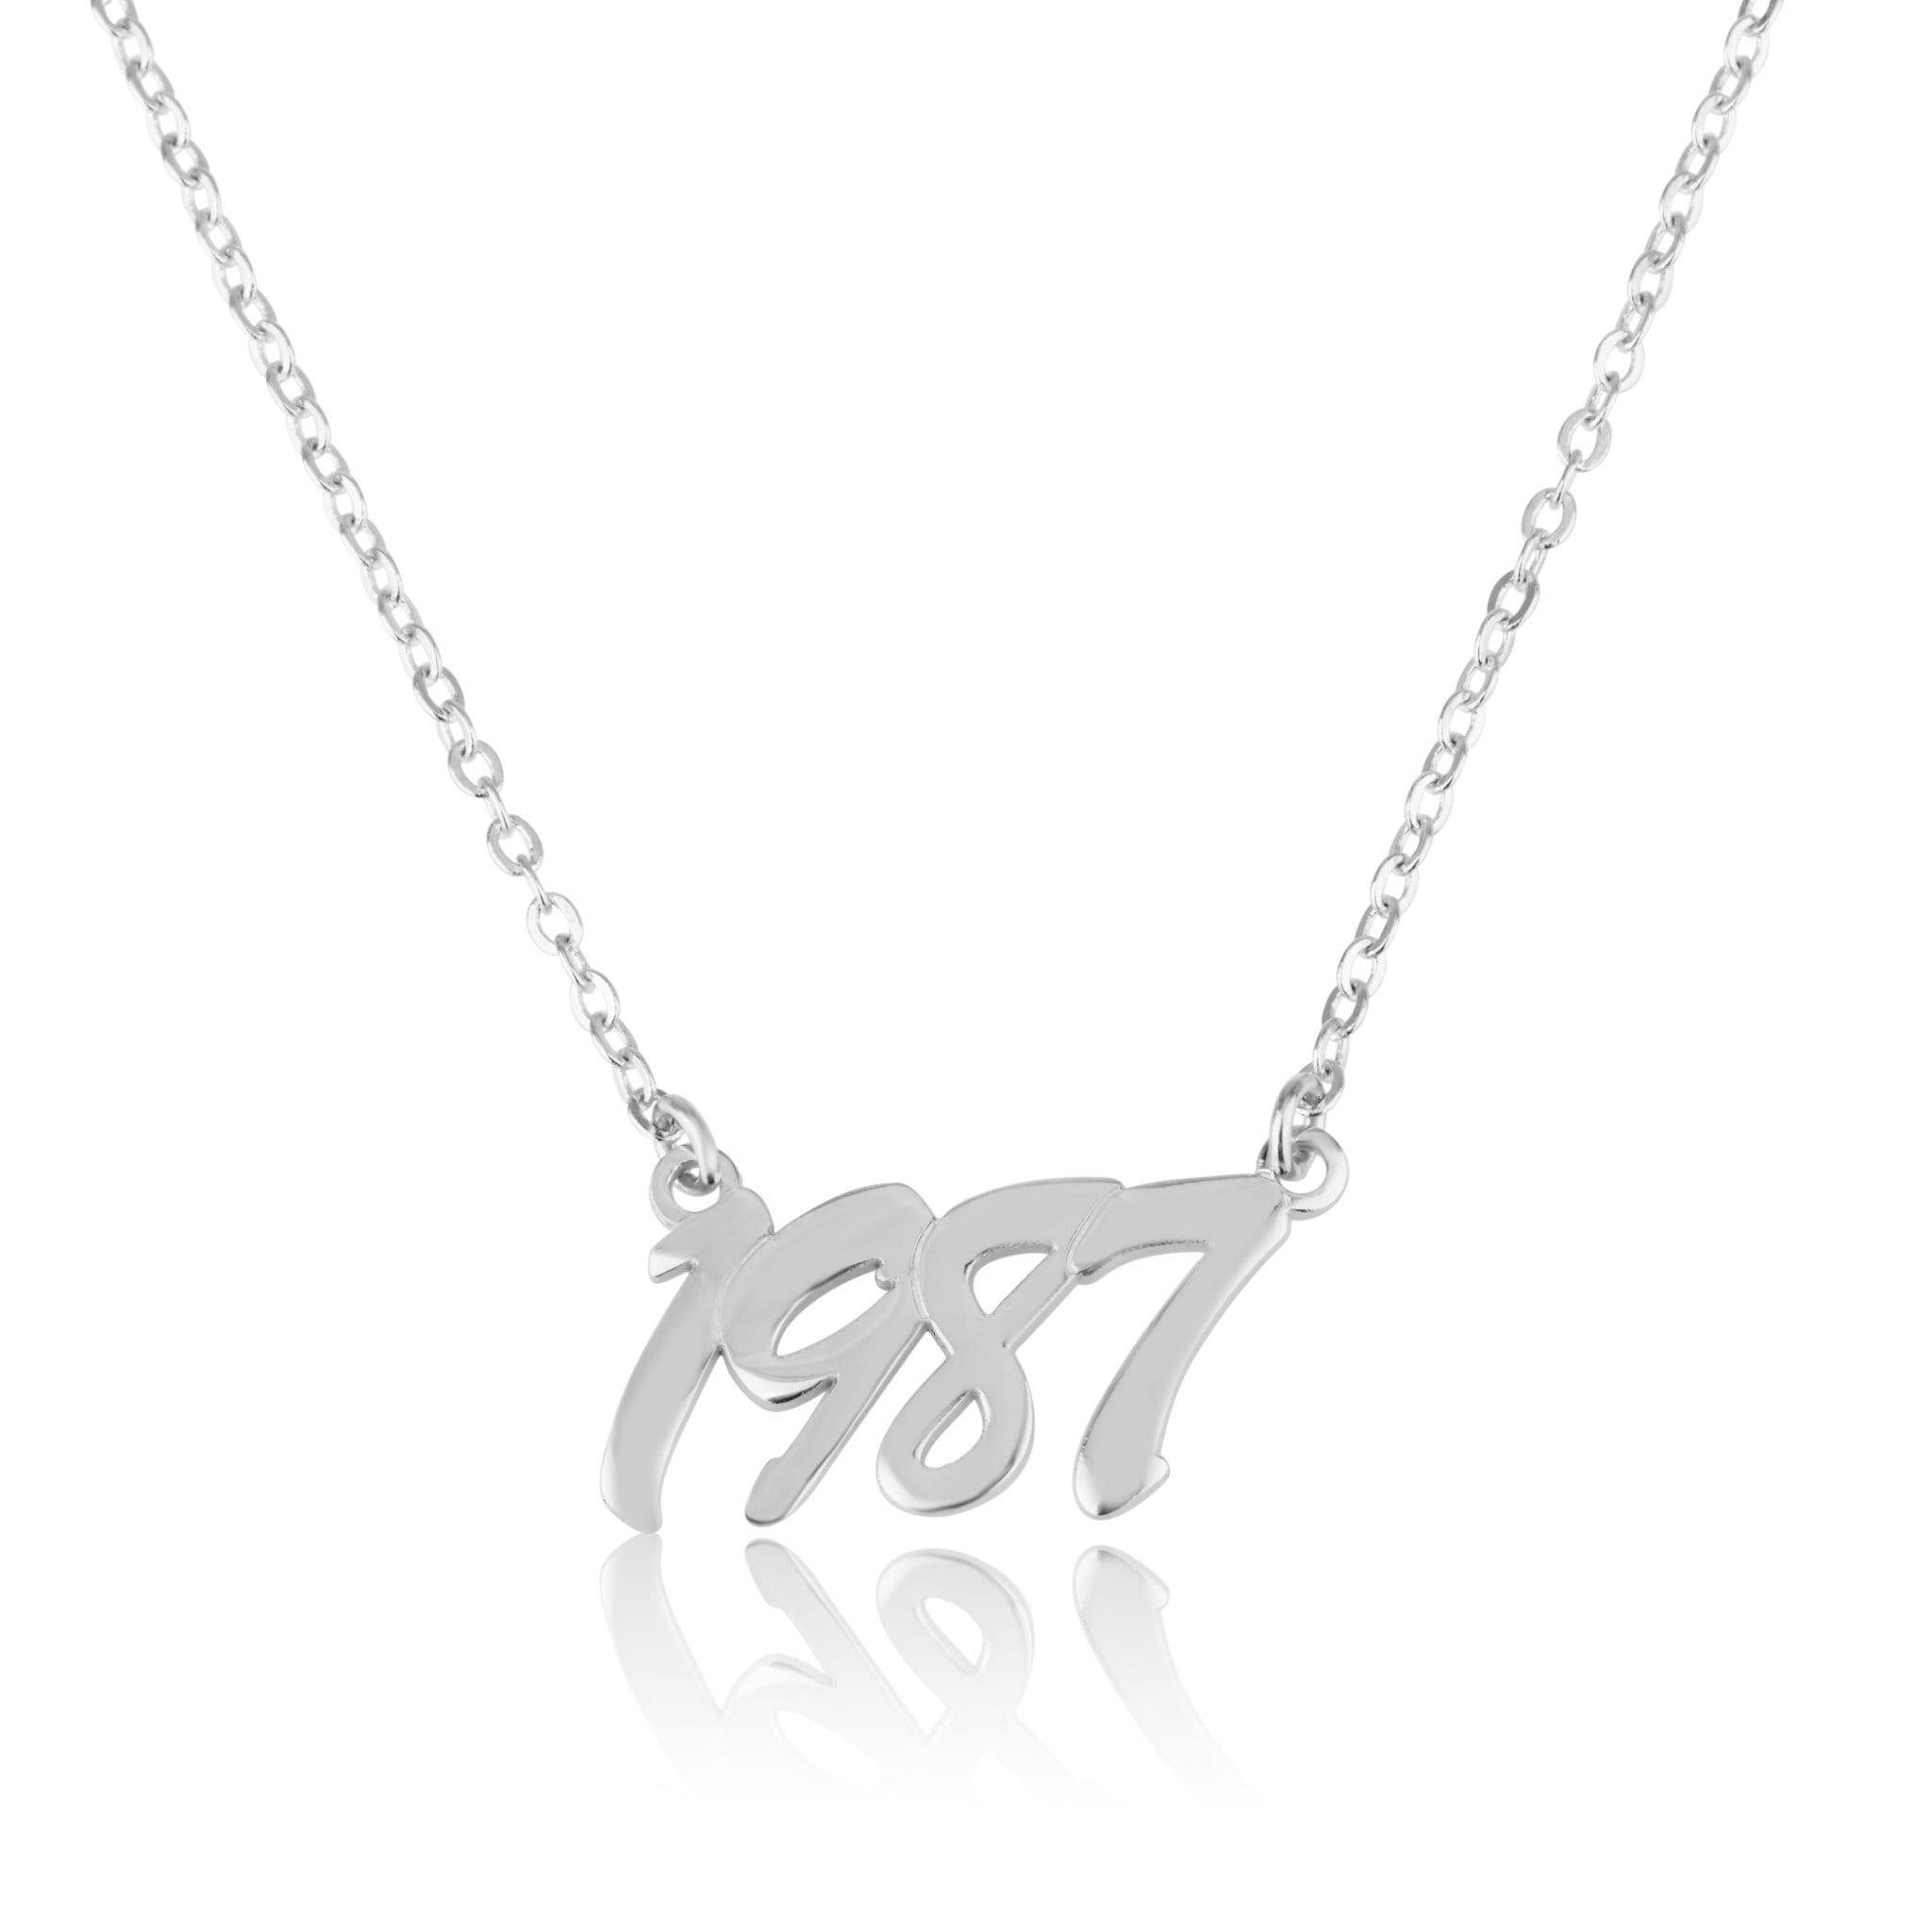 Custom Birth Year Necklace - Beleco Jewelry